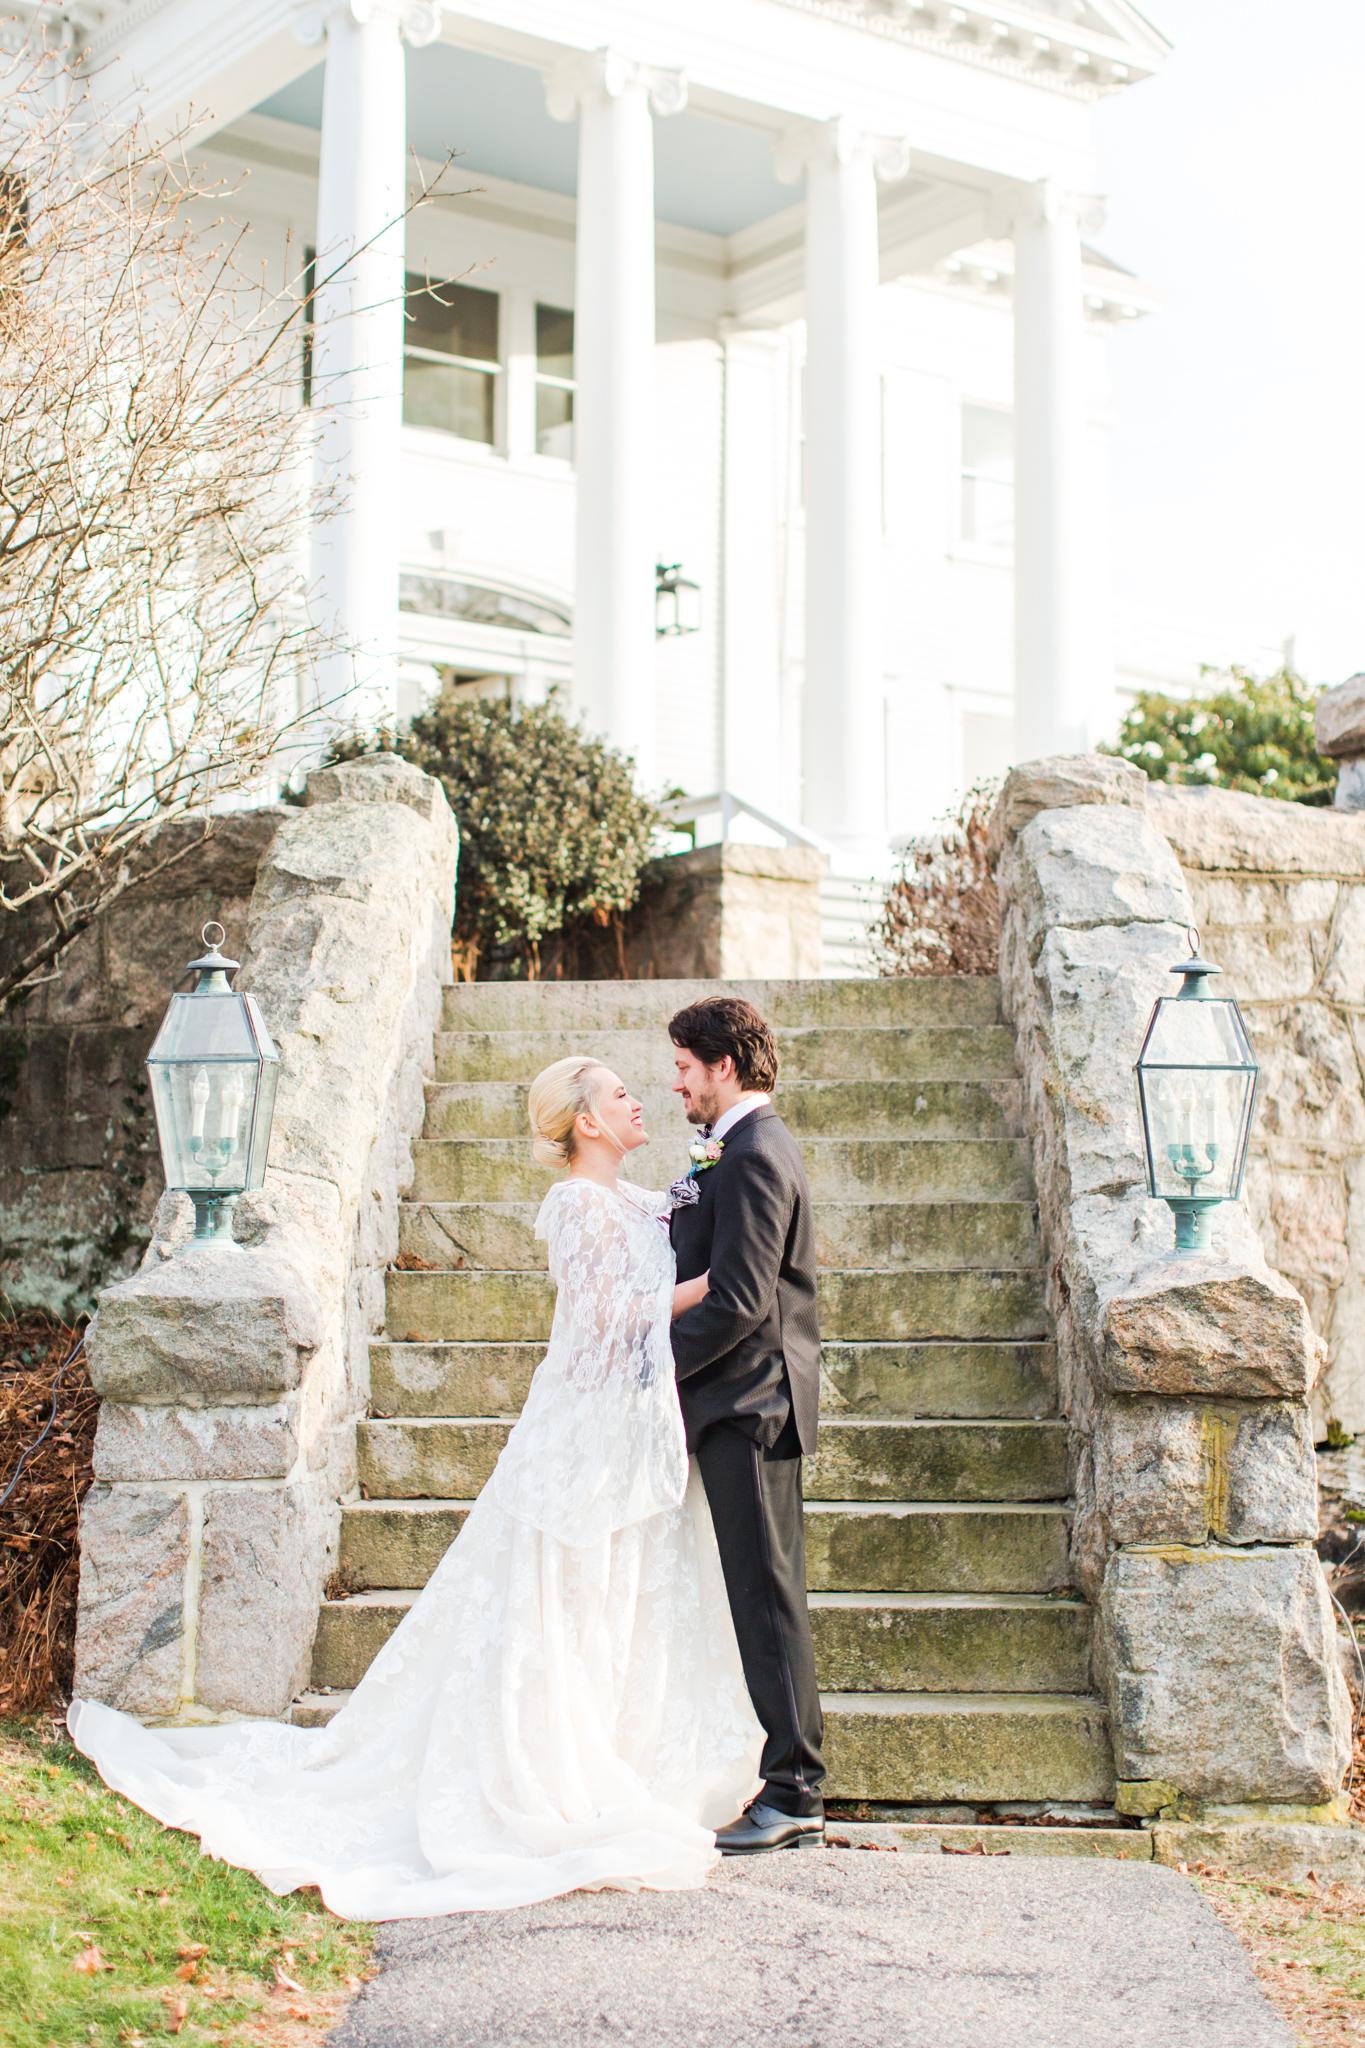 Haley Mansion Winter Wedding - Shaina Lee Photography-298.jpg